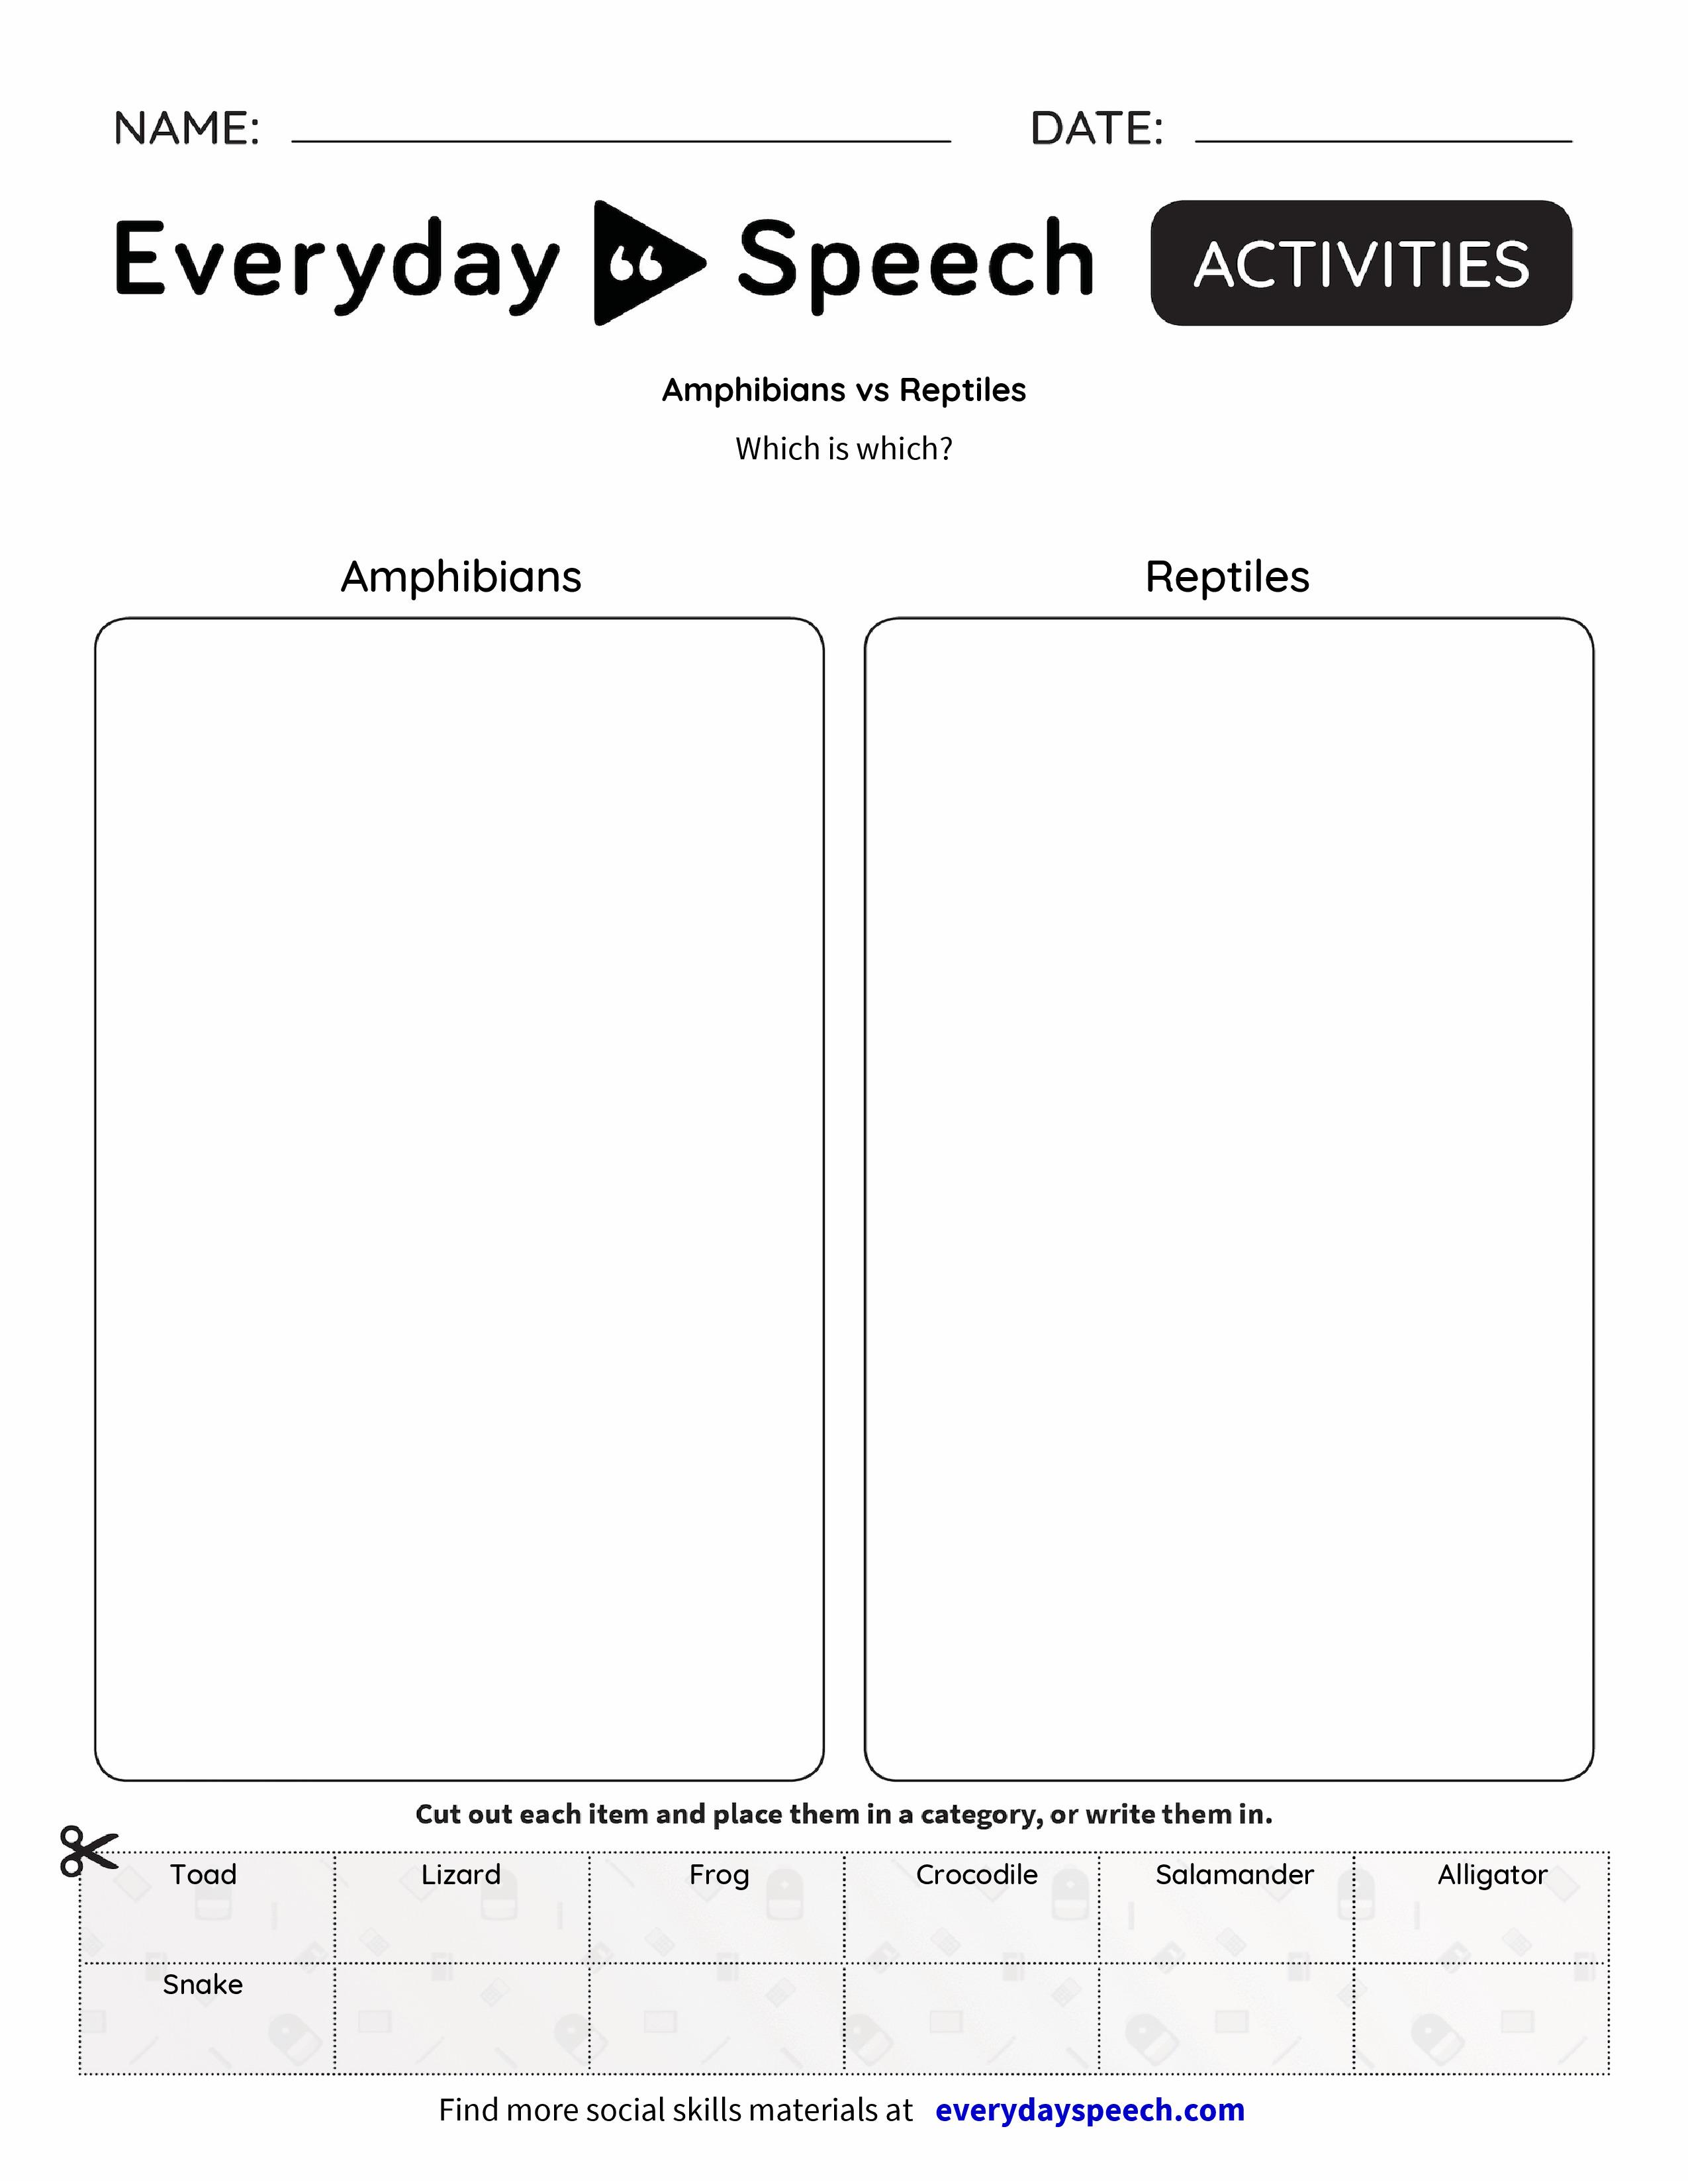 amphibians vs reptiles everyday speech everyday speech. Black Bedroom Furniture Sets. Home Design Ideas